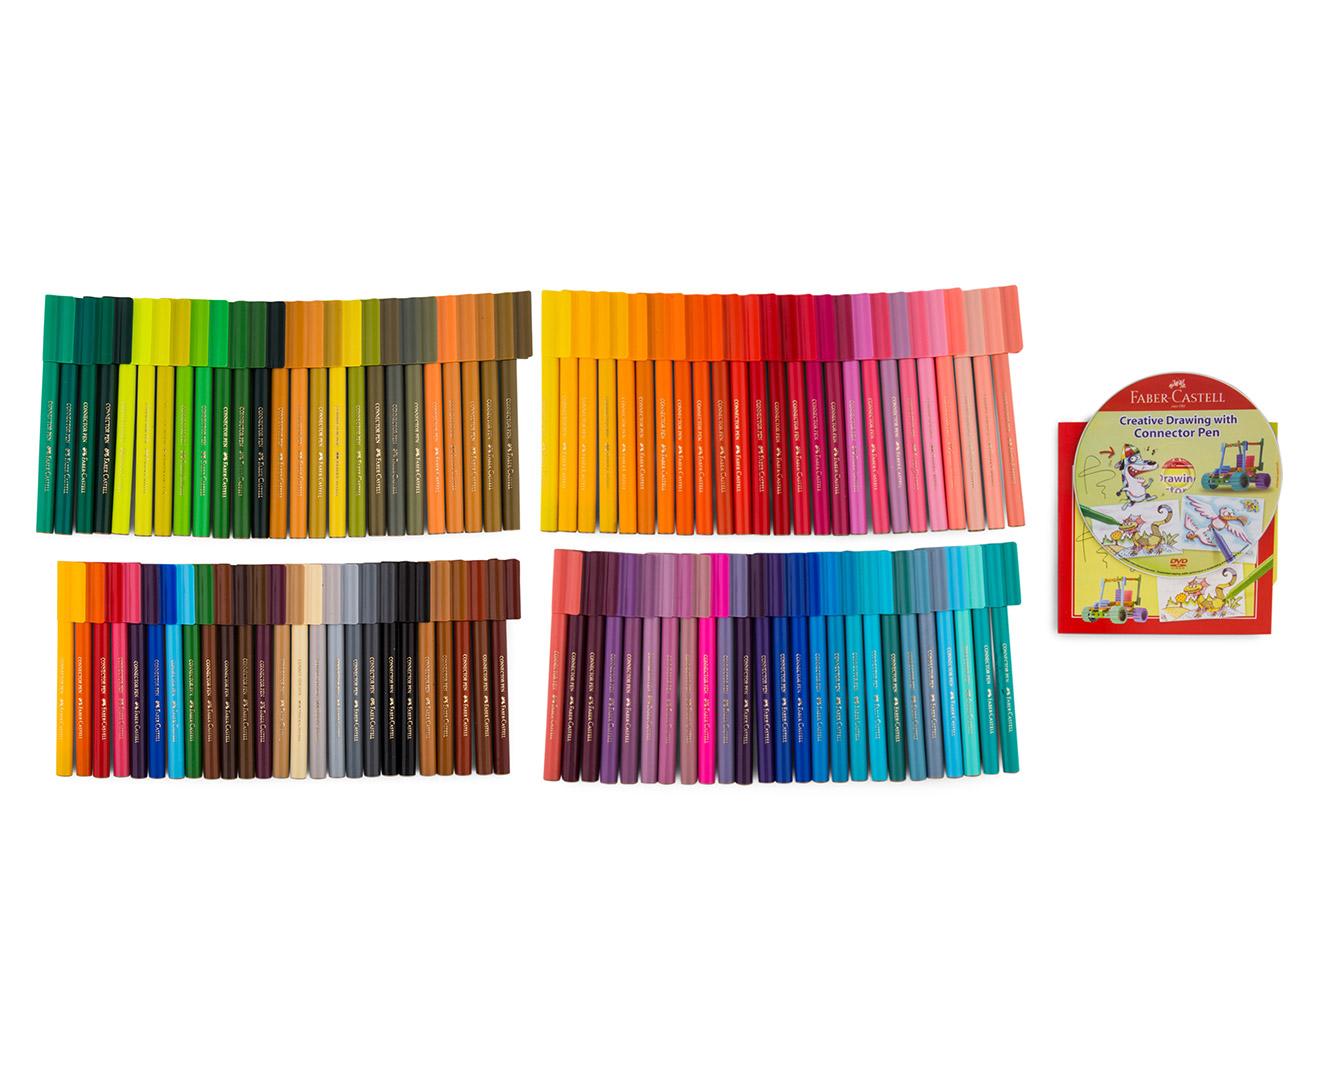 Faber Castell 100 Connector Pens Caddy Case Mumgo Com Au